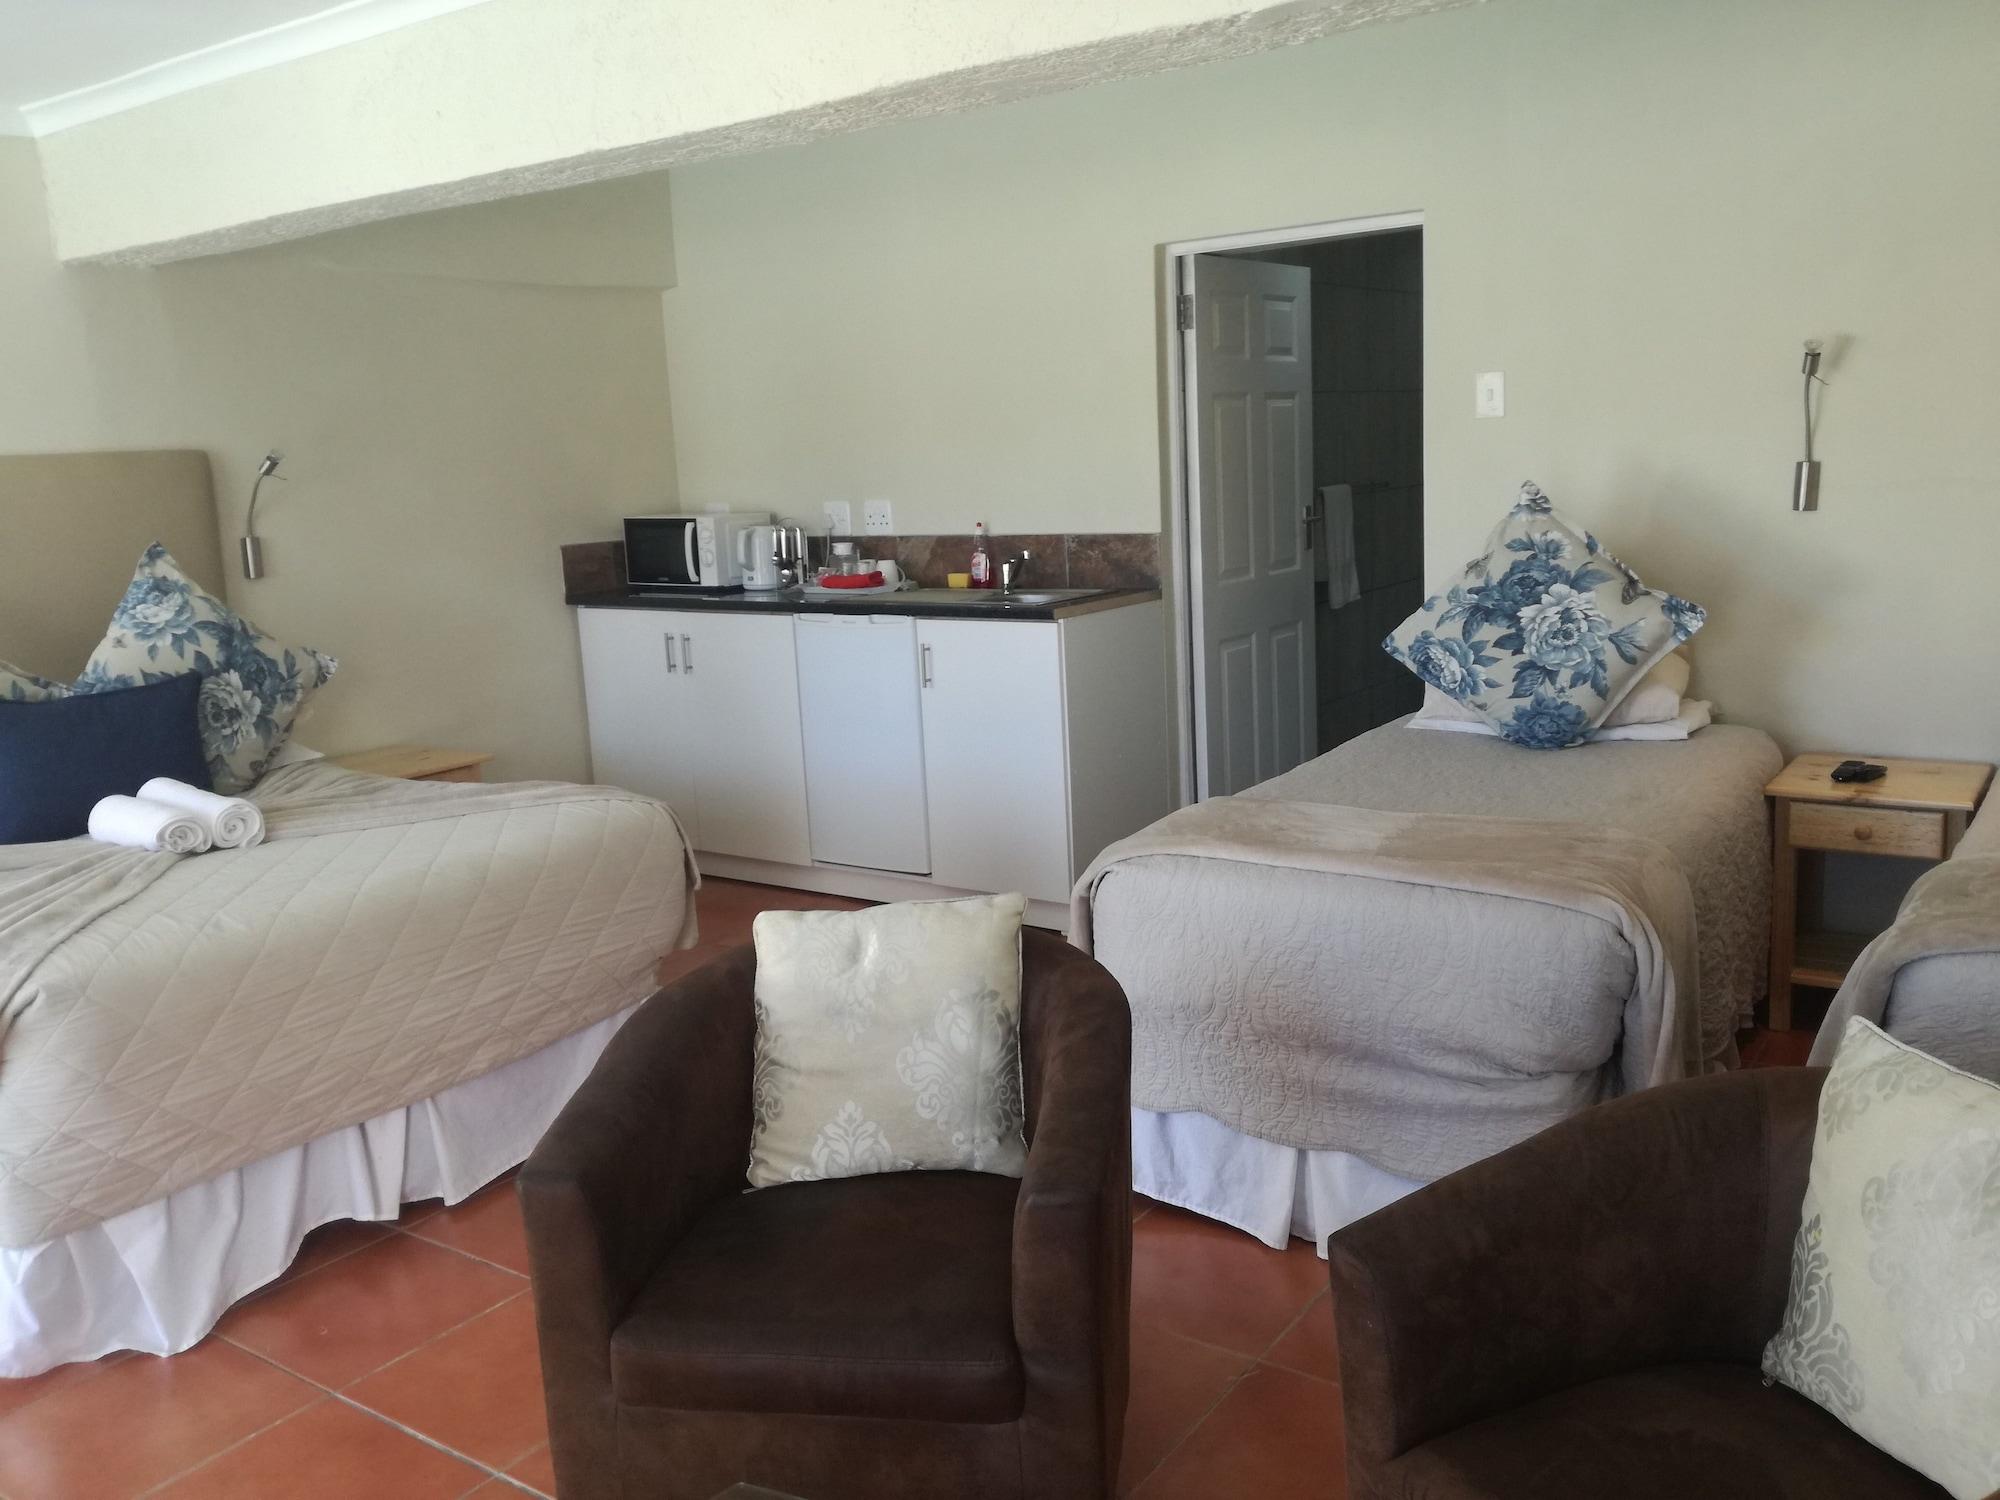 Framesby Guesthouse, Nelson Mandela Bay